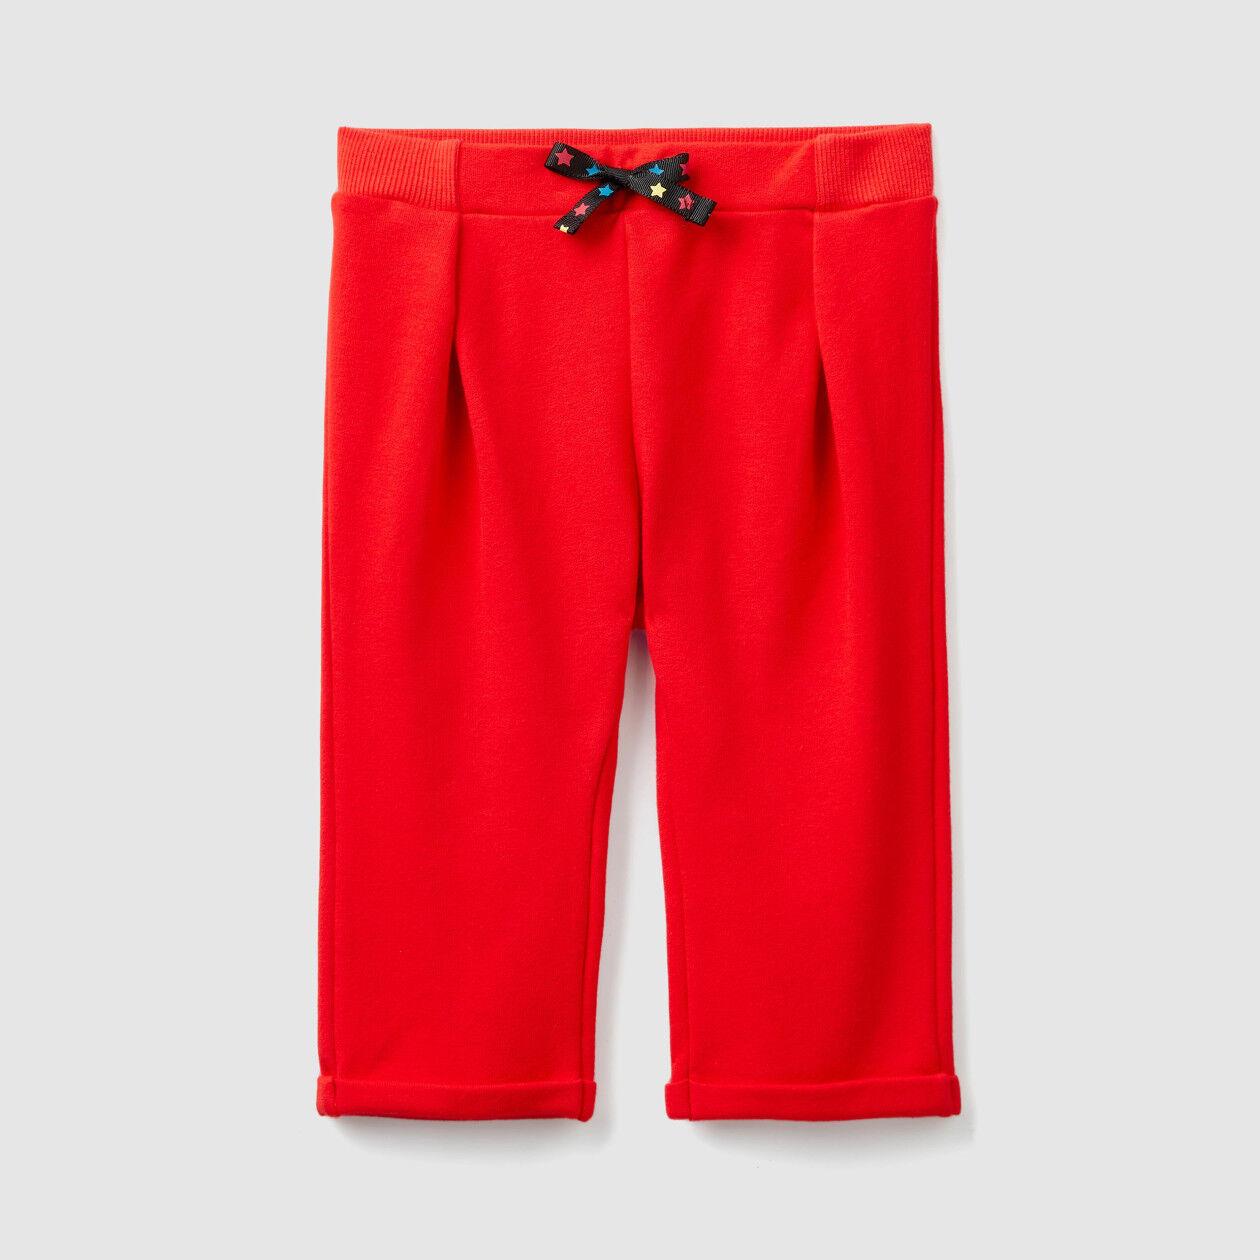 Sweatpants with cuff